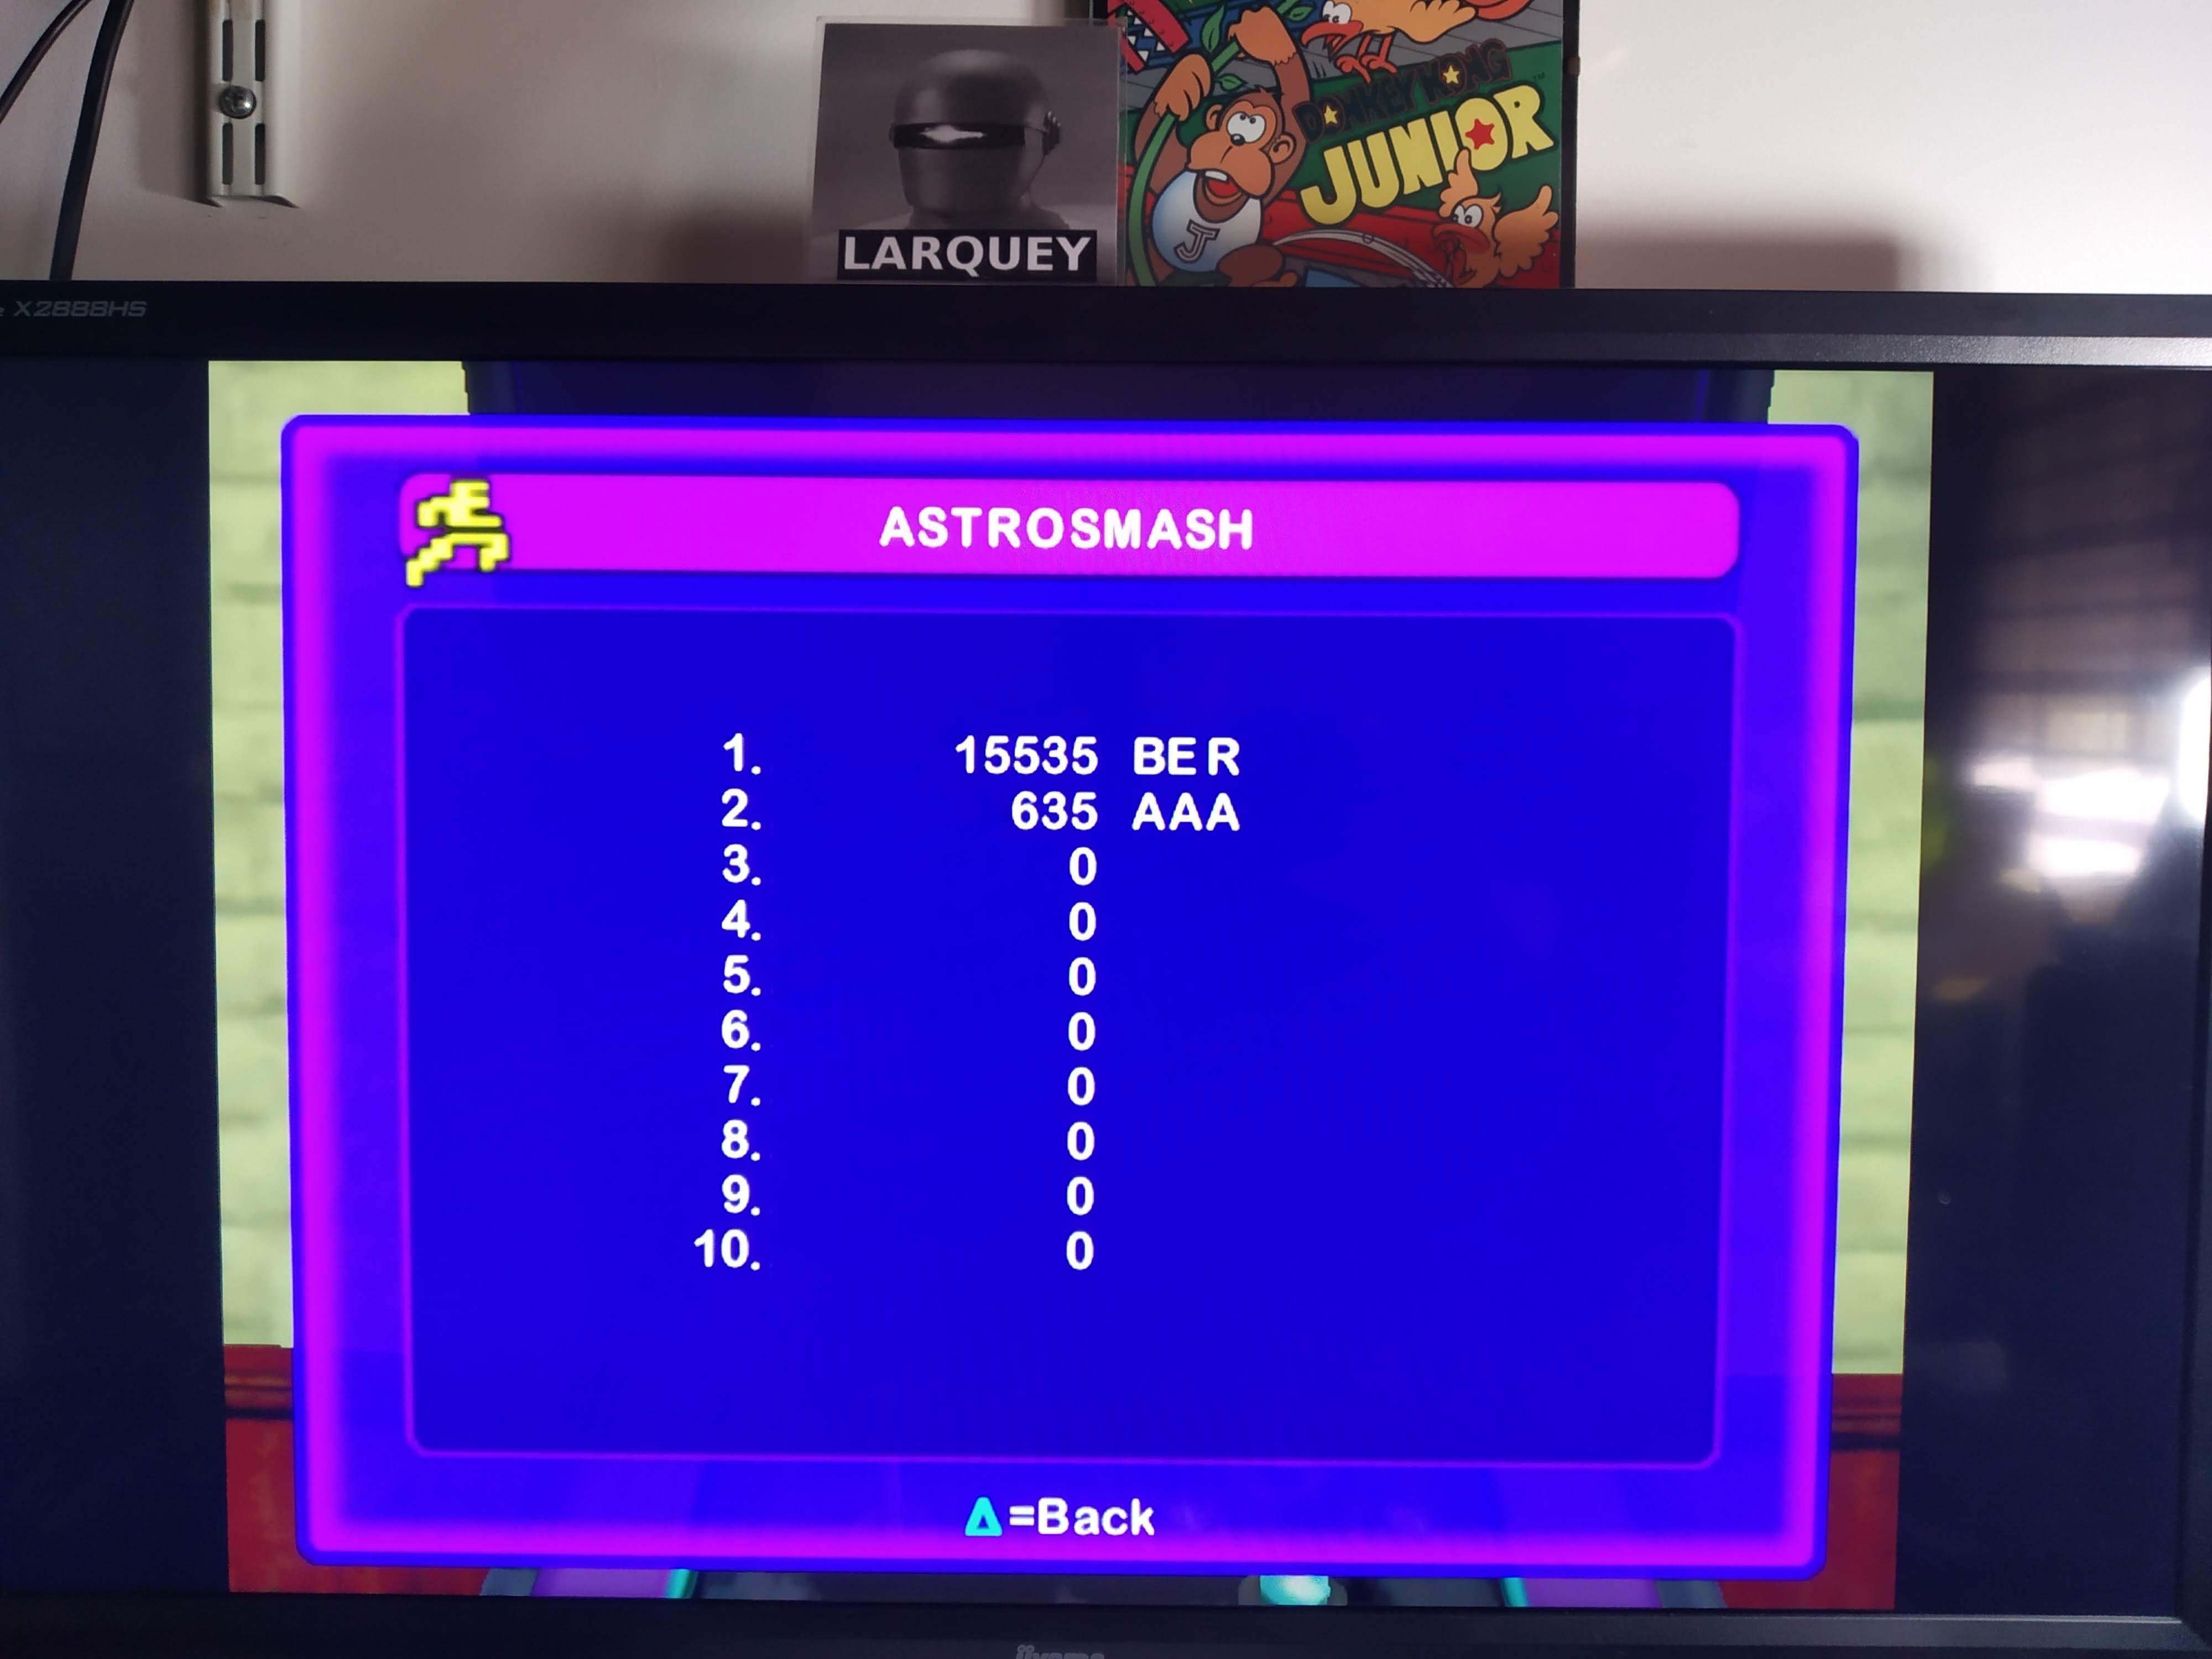 Larquey: Intellivision Lives: Astrosmash (Playstation 2 Emulated) 15,535 points on 2020-08-07 12:30:10